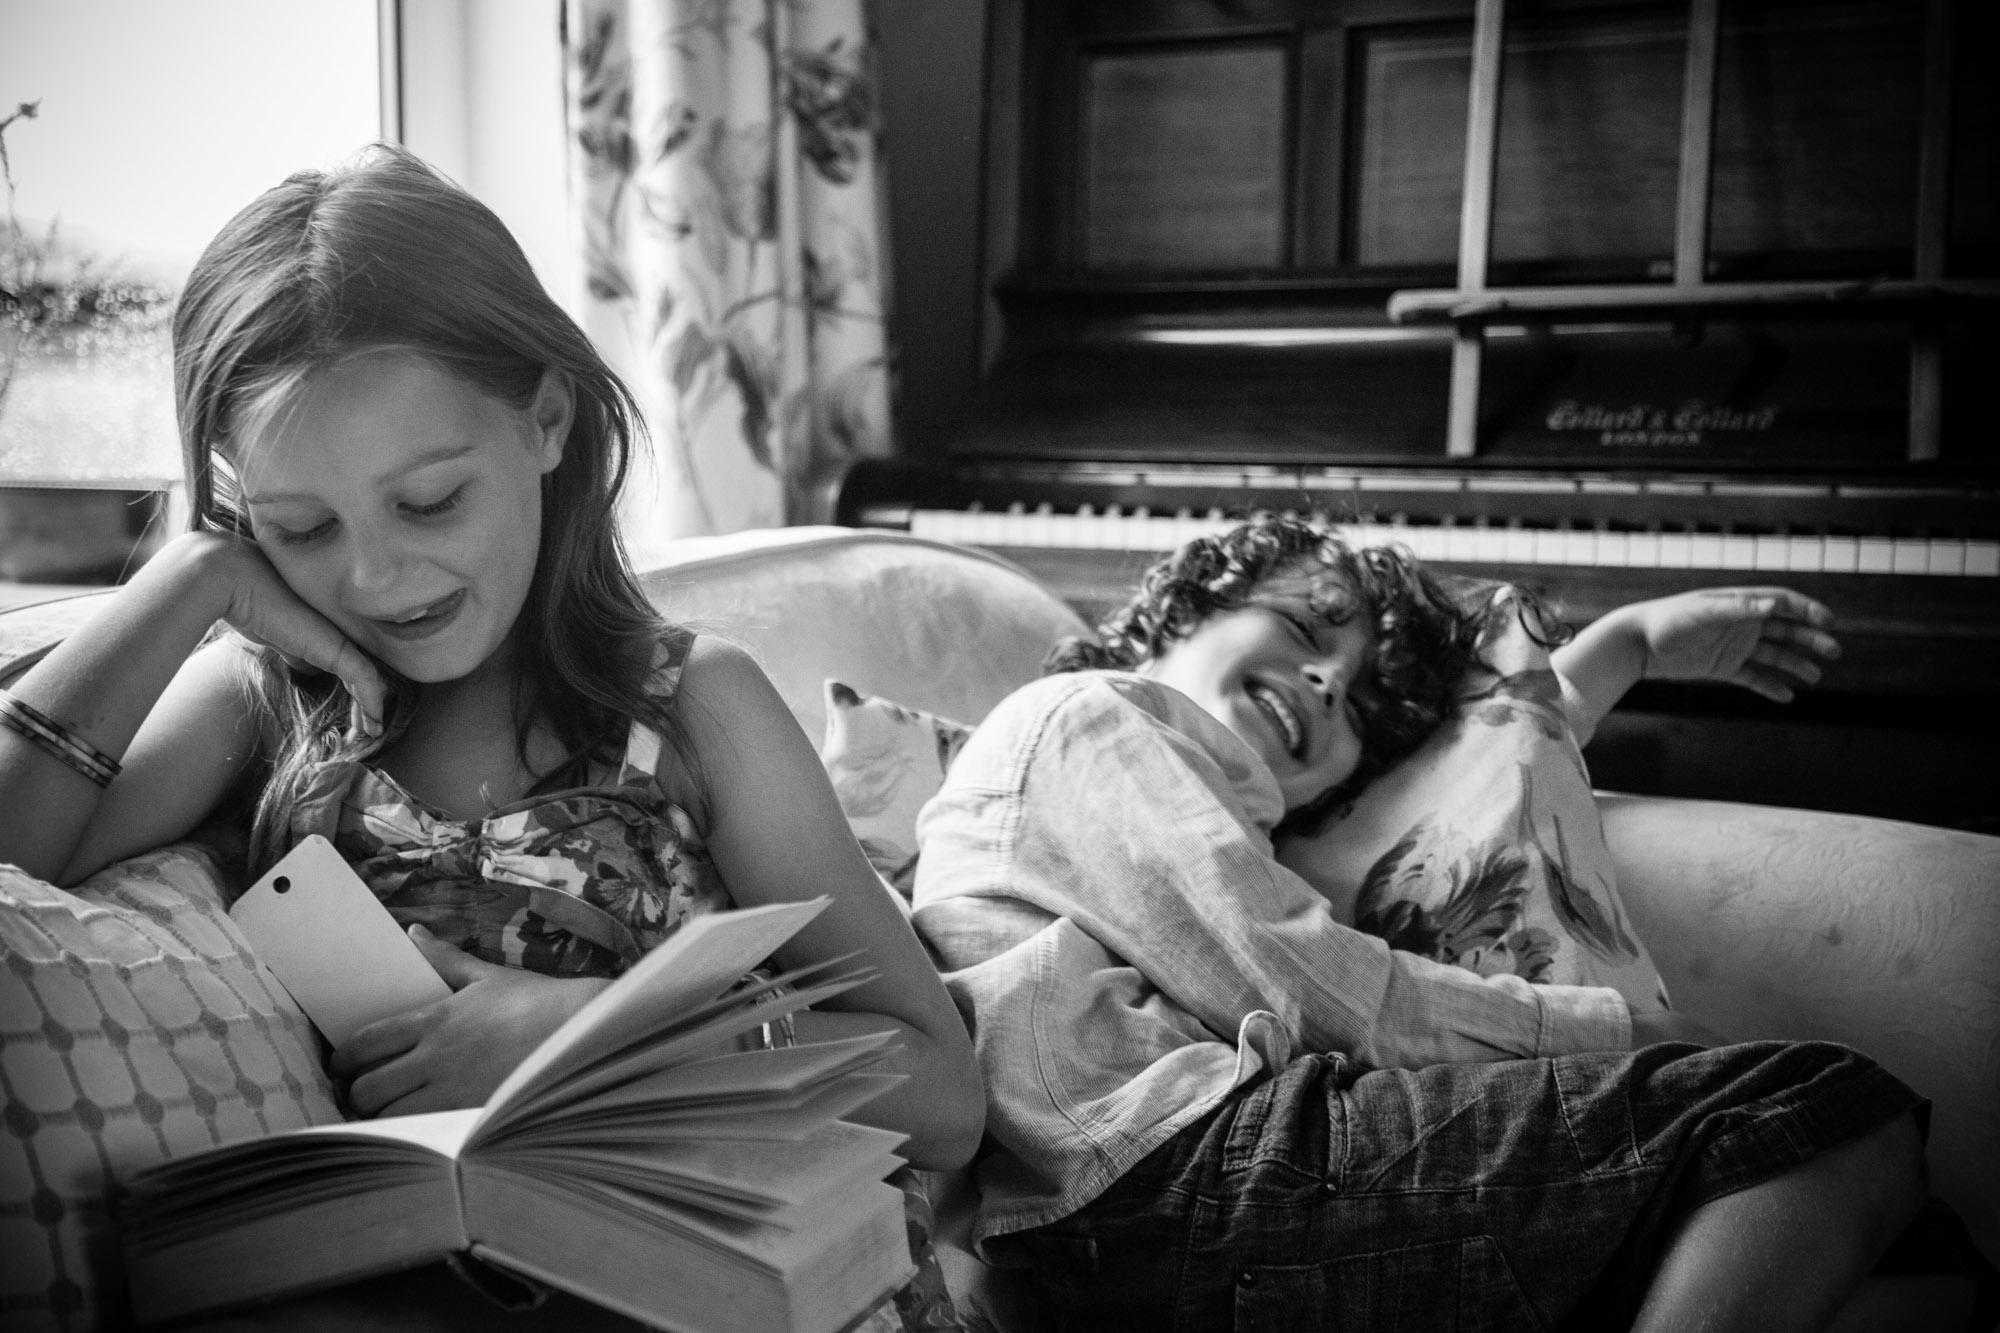 family-life-family-photographer-oxford-london-jonathan-self-photography-4.jpg